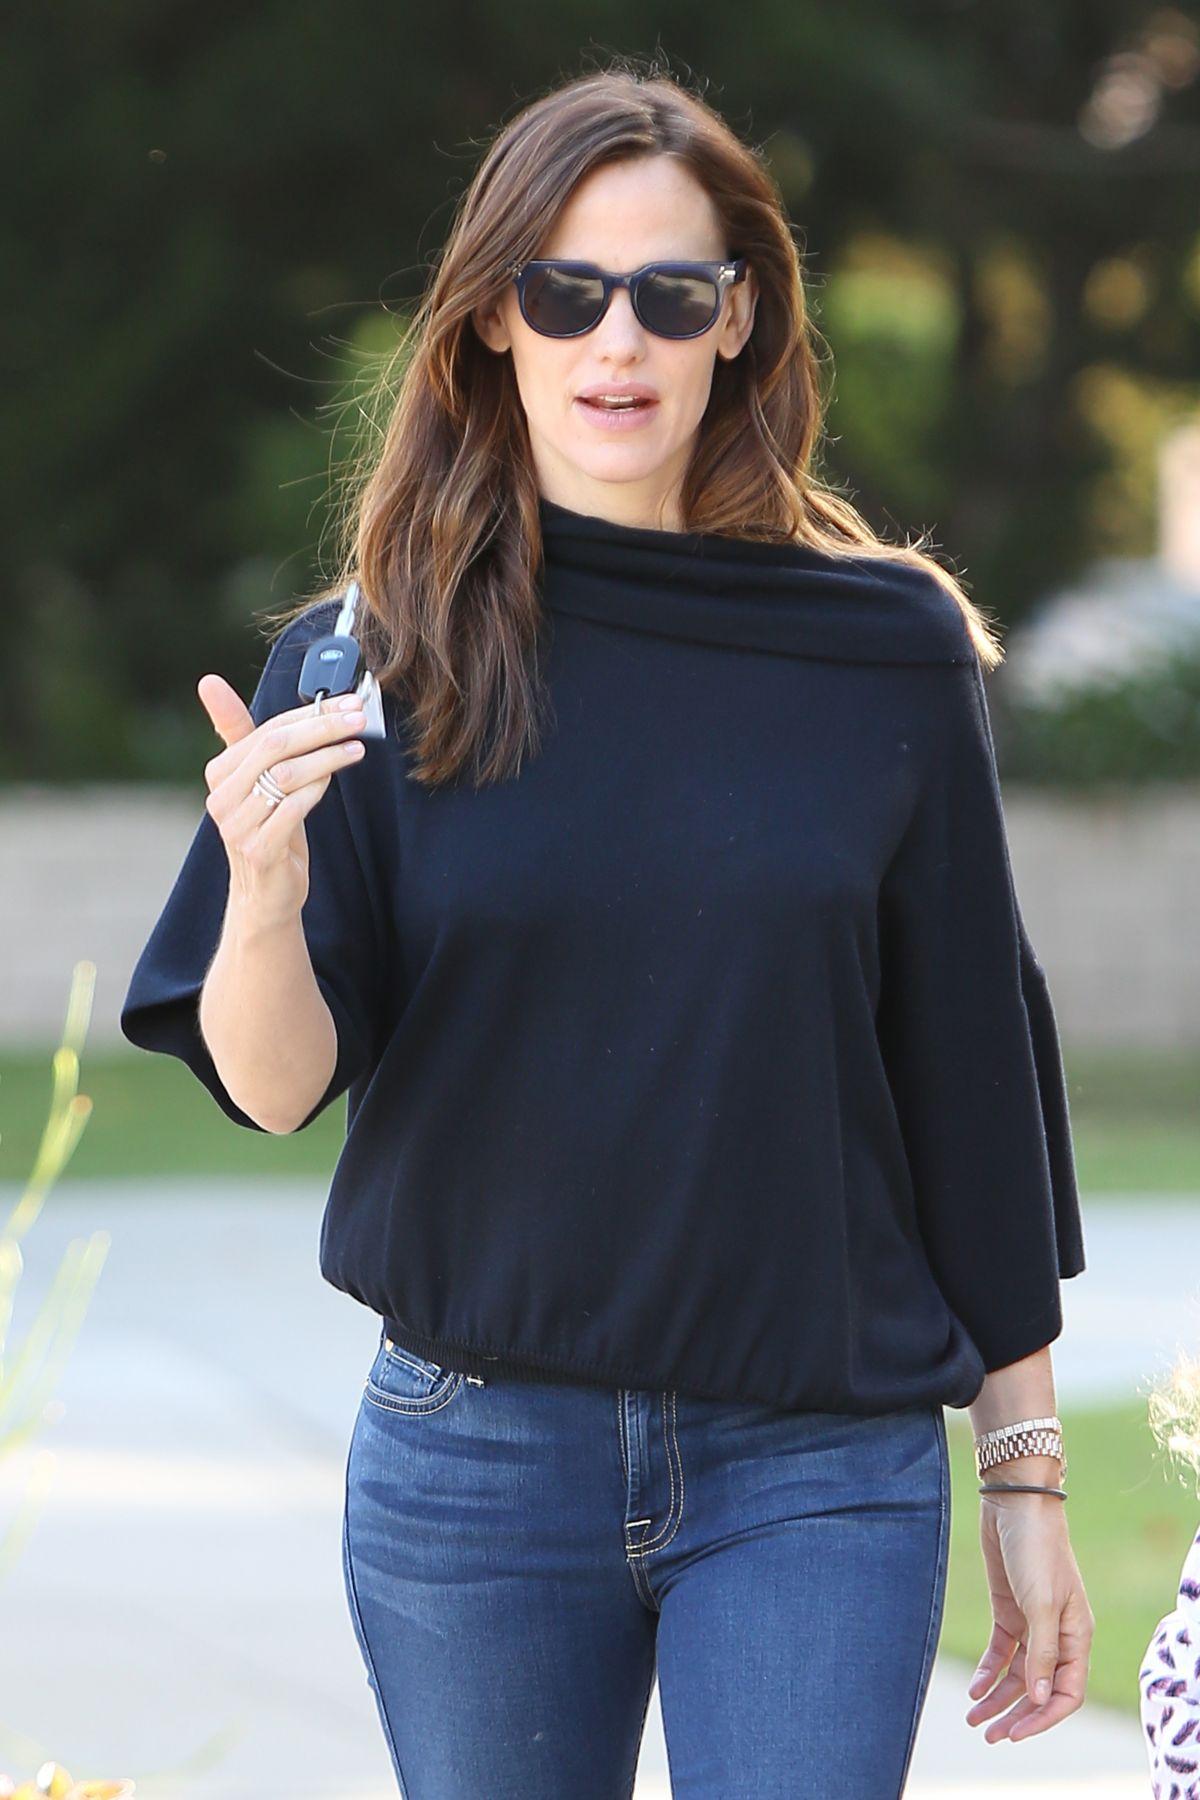 JENNIFER GARNER in Tight Jeans Out in Santa Monica 04/28/2016